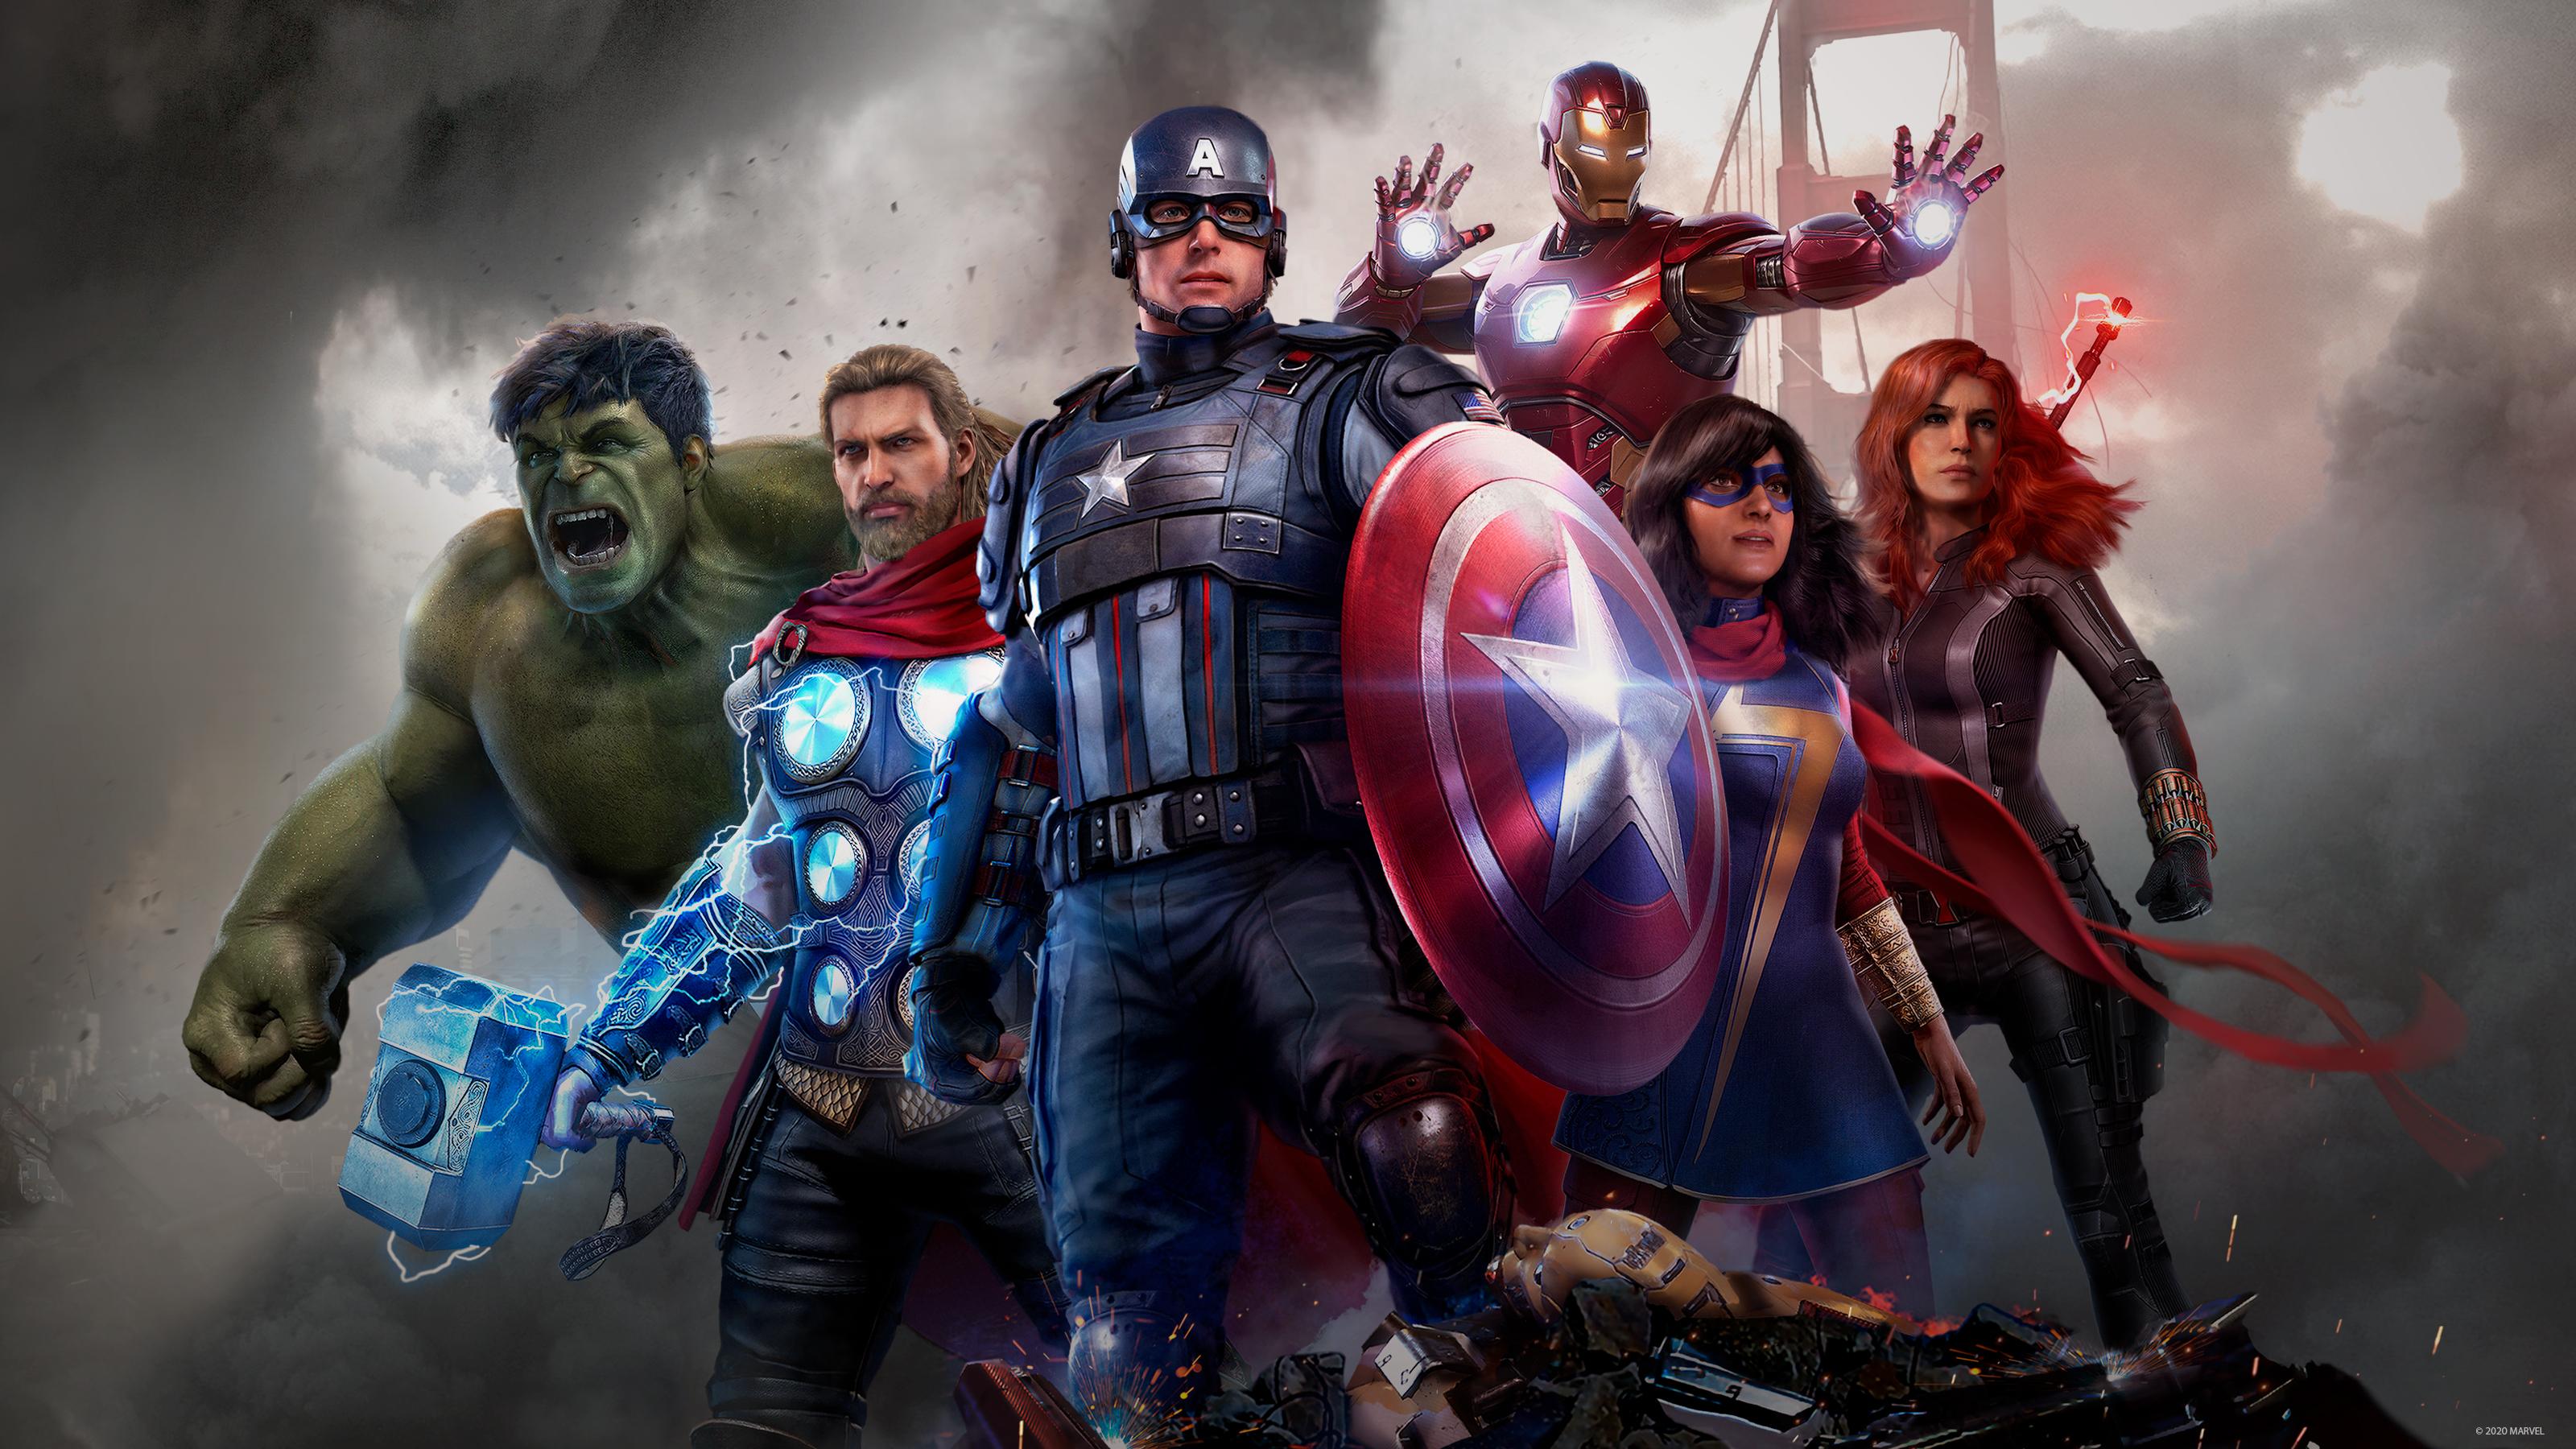 Обладатели Marvel's Avengers на PS4 и Xbox One получат бесплатную копию игры для PS5 и Xbox Series X